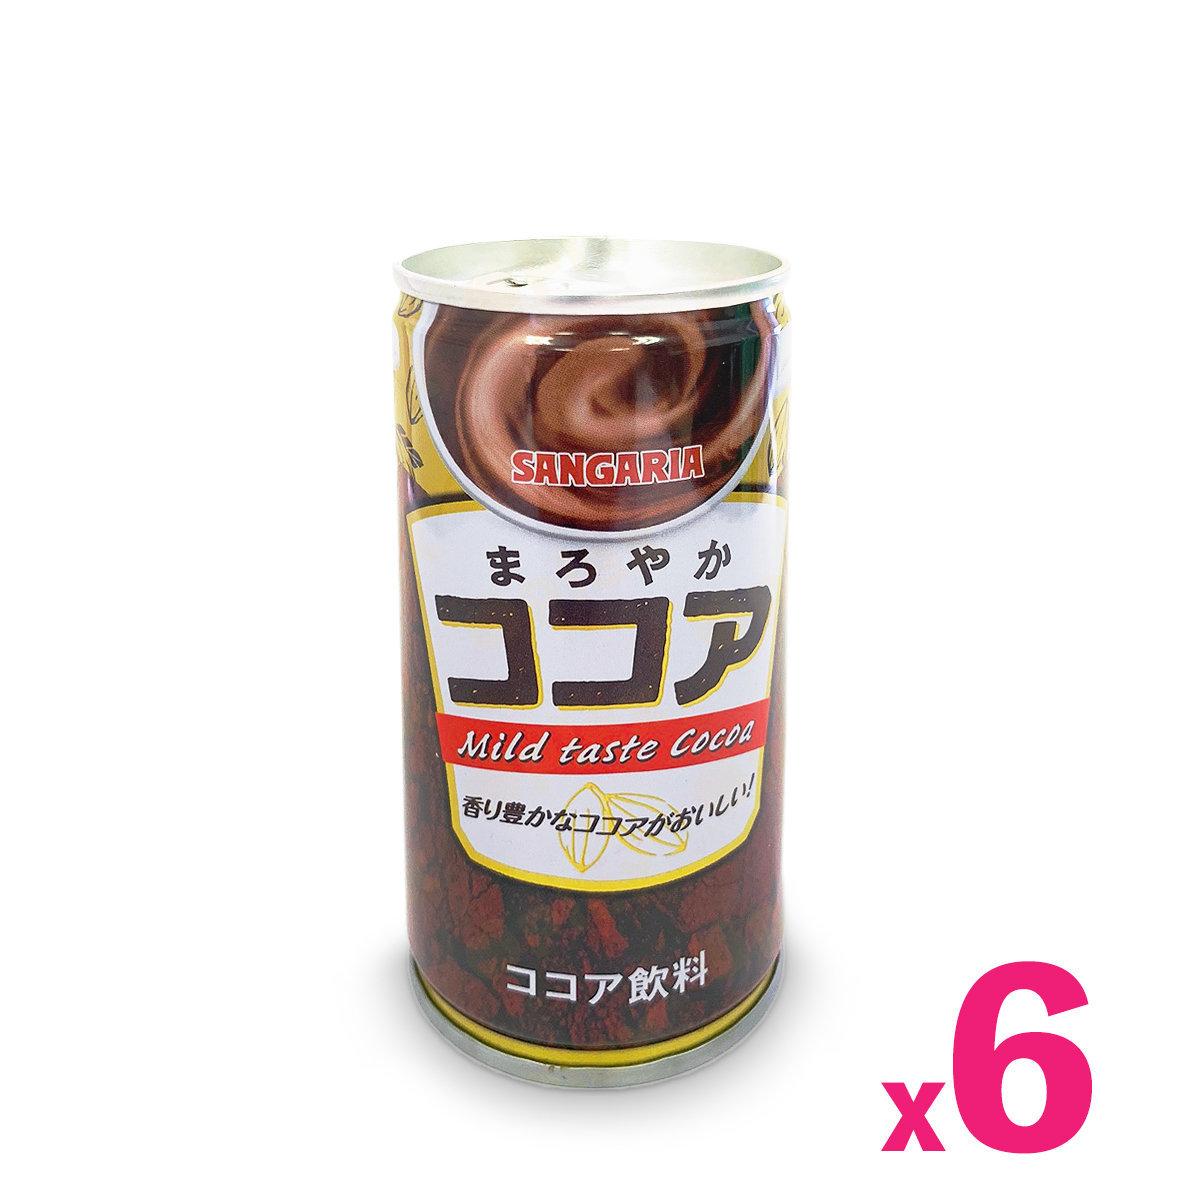 Japanese Mild Taste Cocoa (190ml) x 6